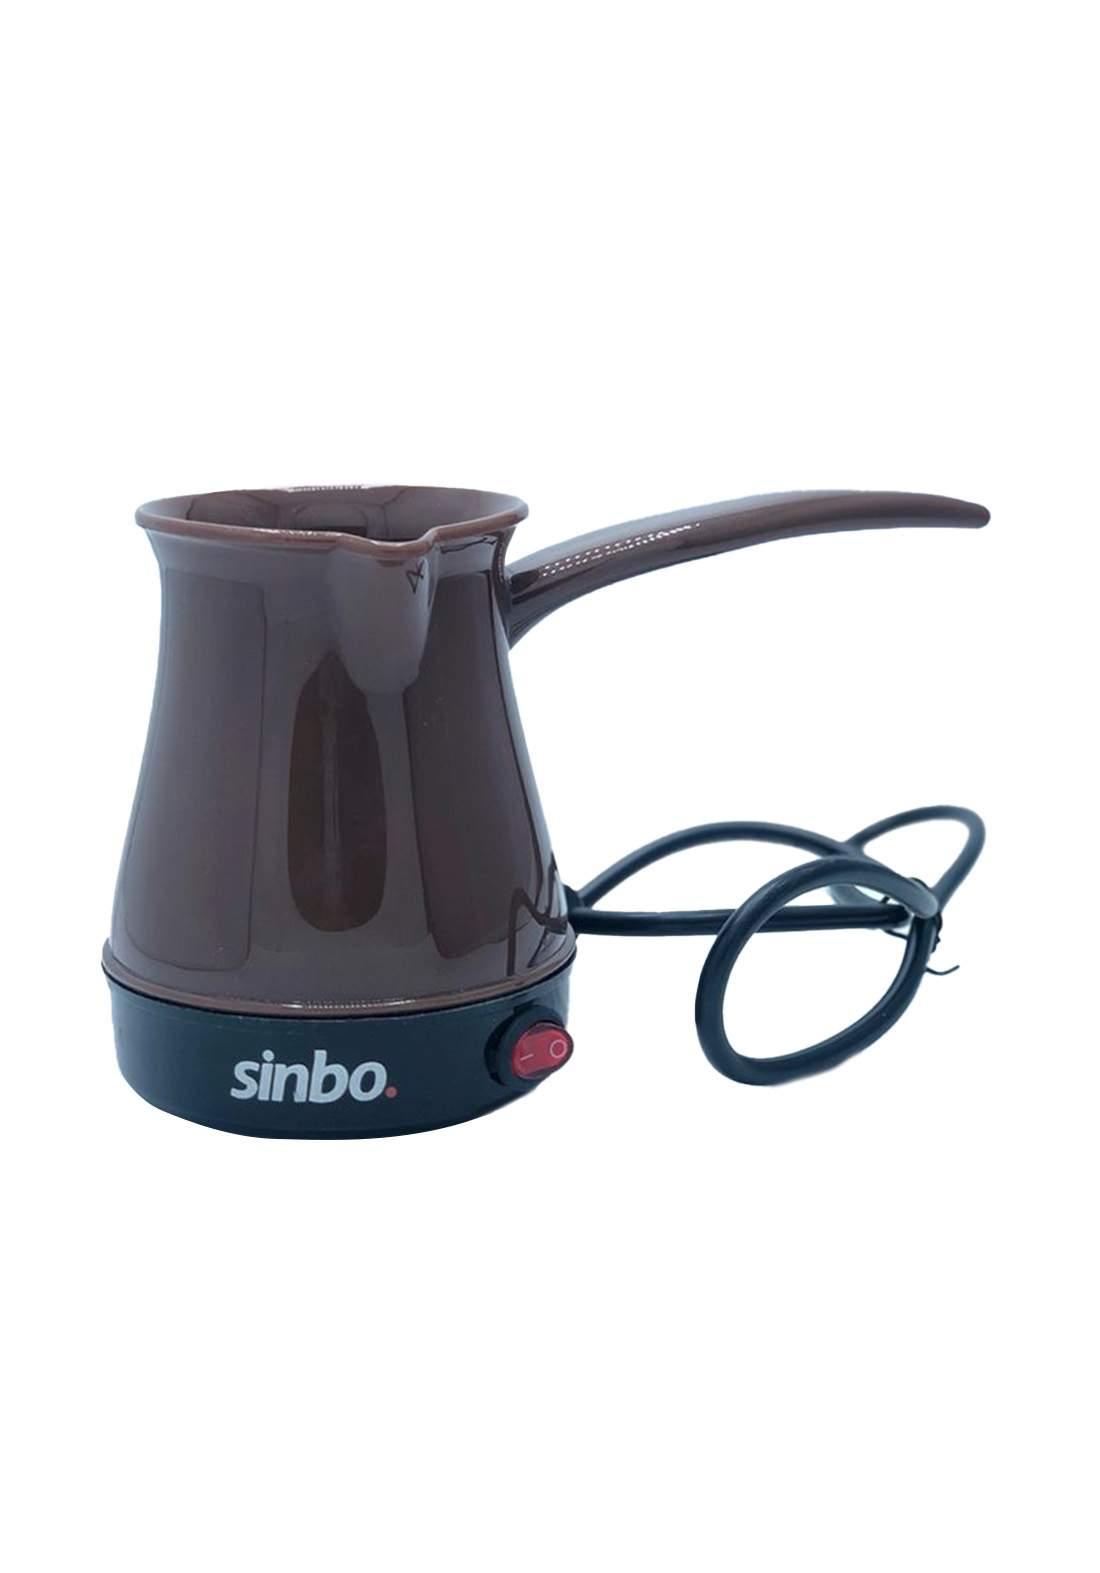 Sinbo SCM-2928 وعاء قهوة كهربائي